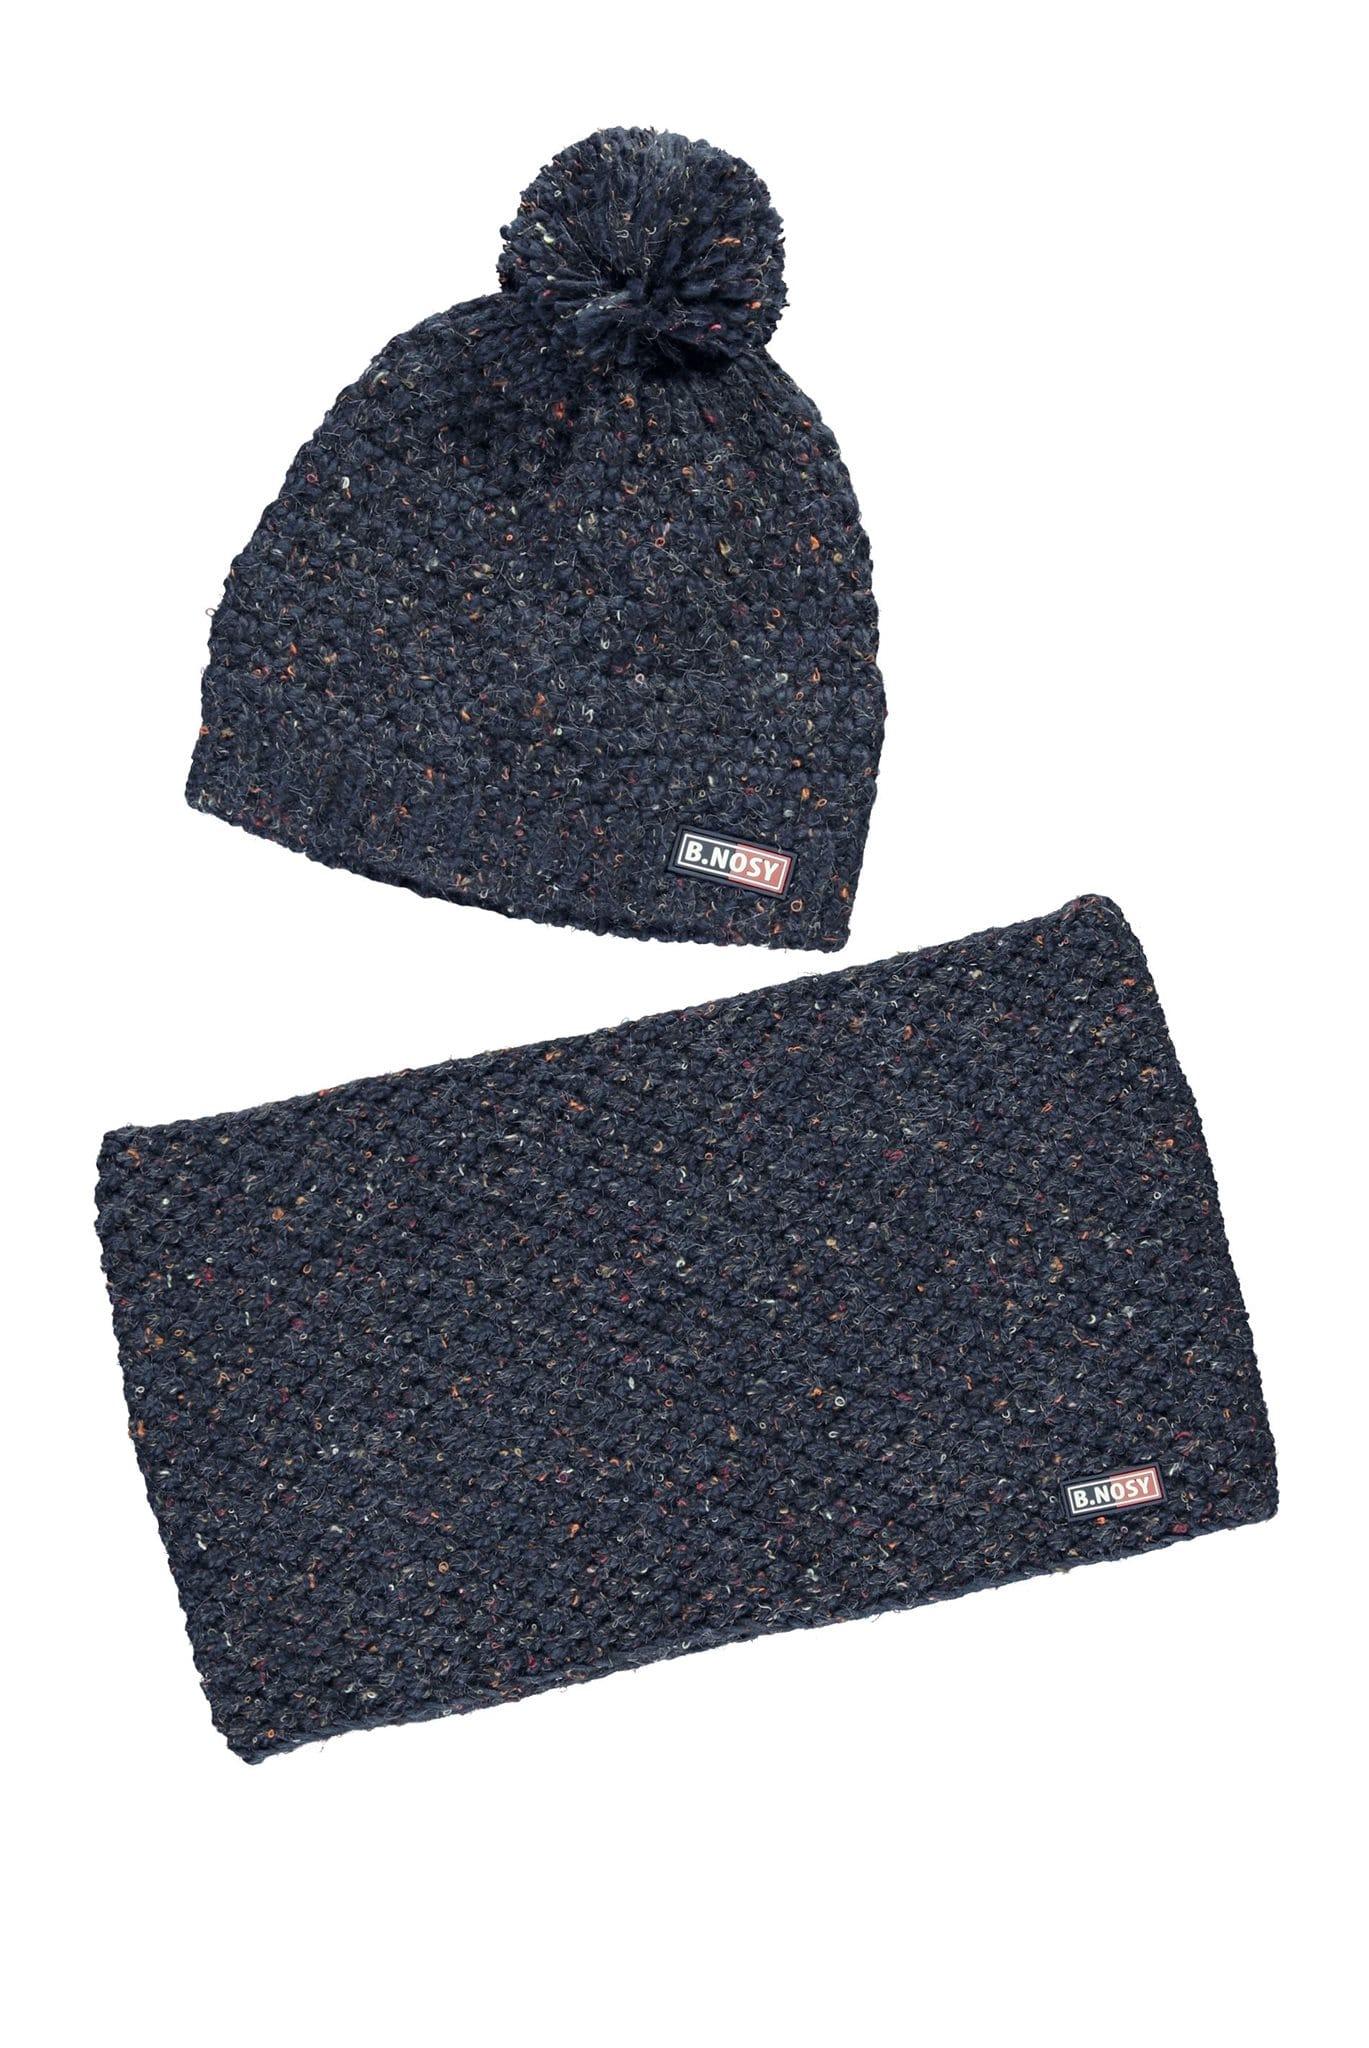 B.Nosy Hat & Neck Warmer mt2